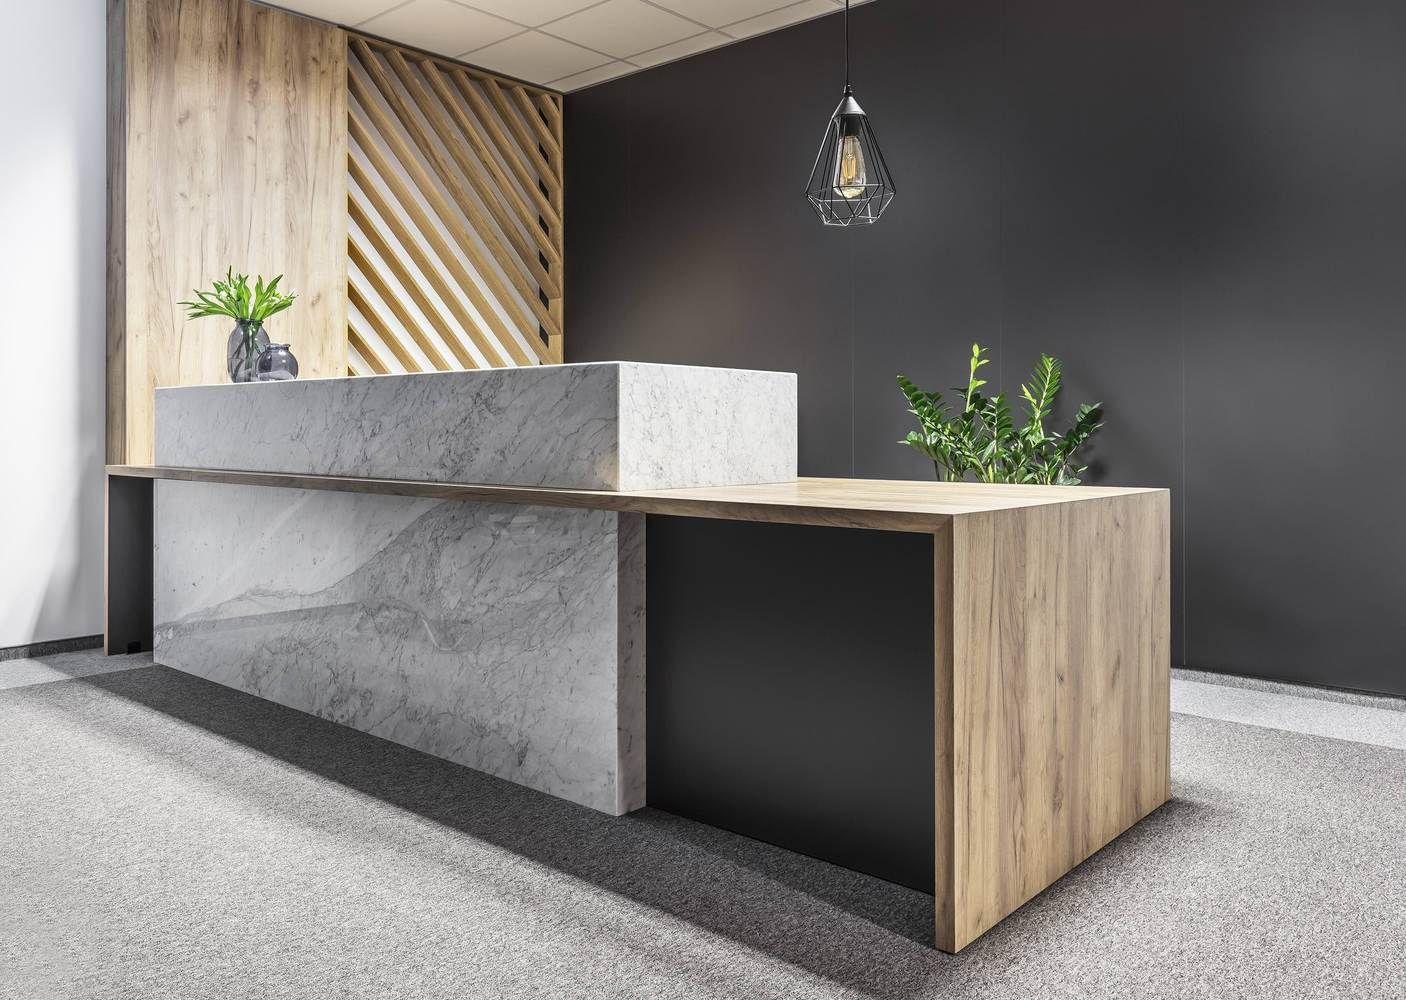 Gallery of Office Space in Poznan / Metaforma - 13 in 2018 ...